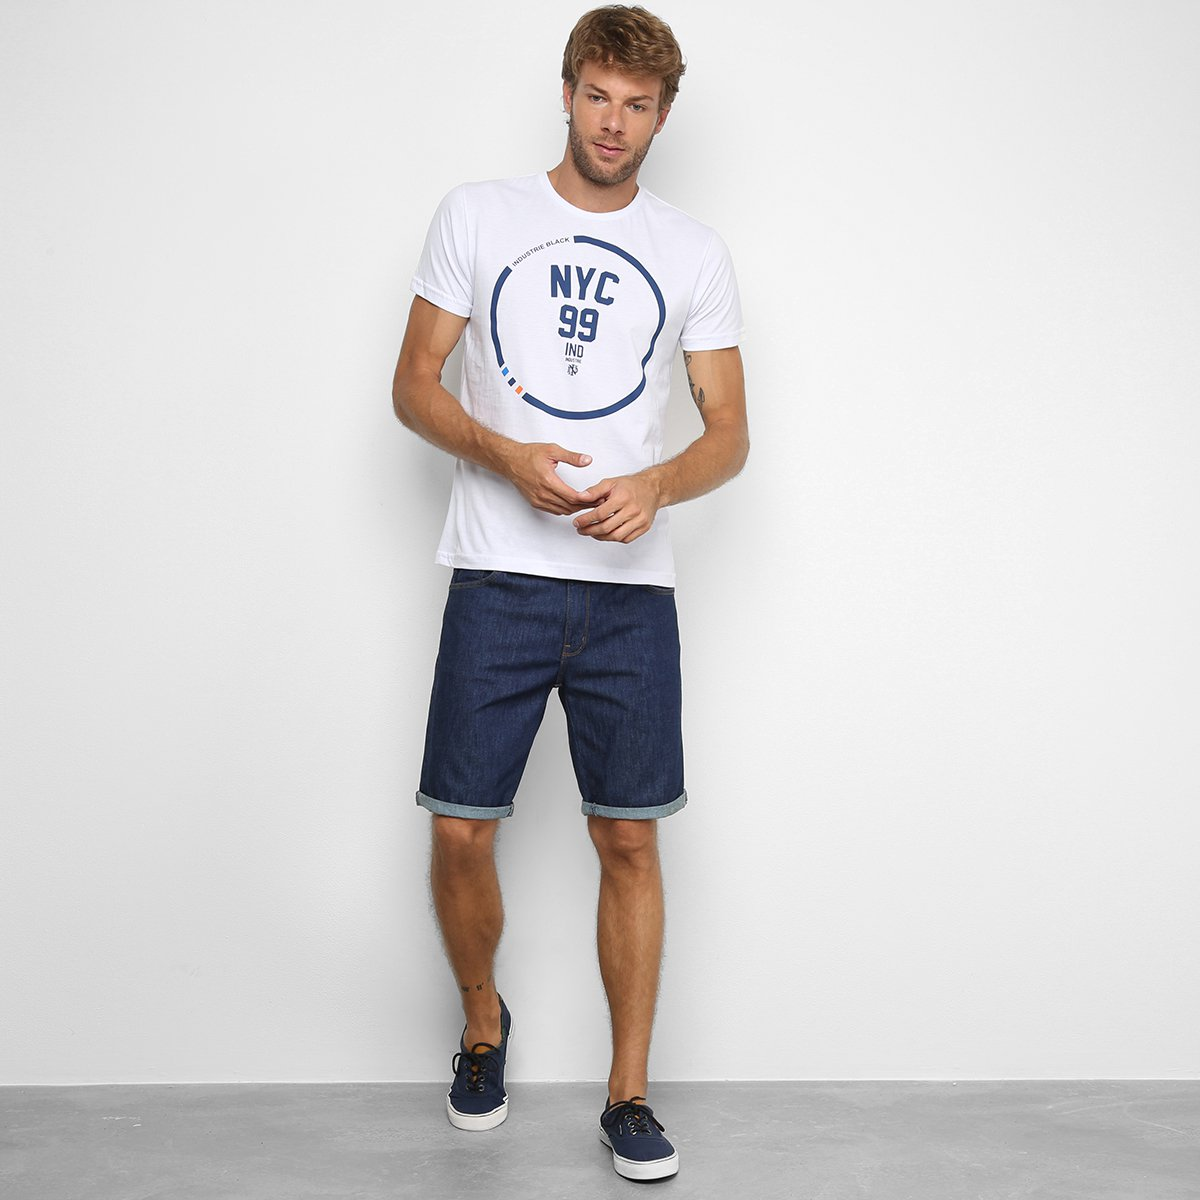 Camiseta Industrie NYC 99 Masculina - Branco